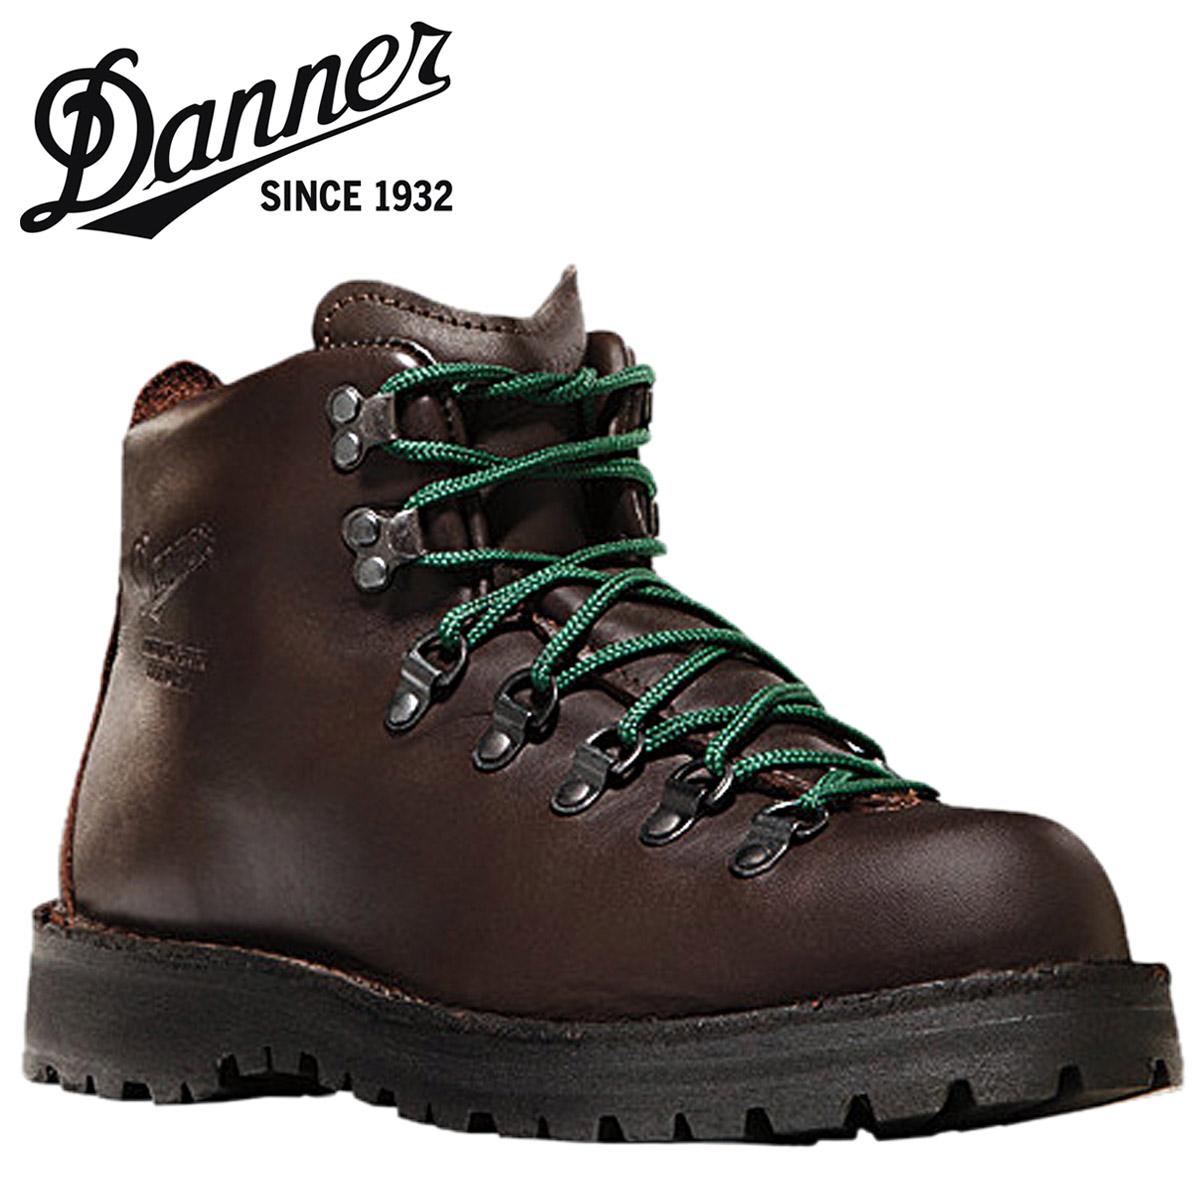 Danner ダナー マウンテンライト2 30800 ダークブラウン Mountain Light II Dワイズ EEワイズ レザー GORE-TEX ブーツ BOOTS Made in USA メンズ